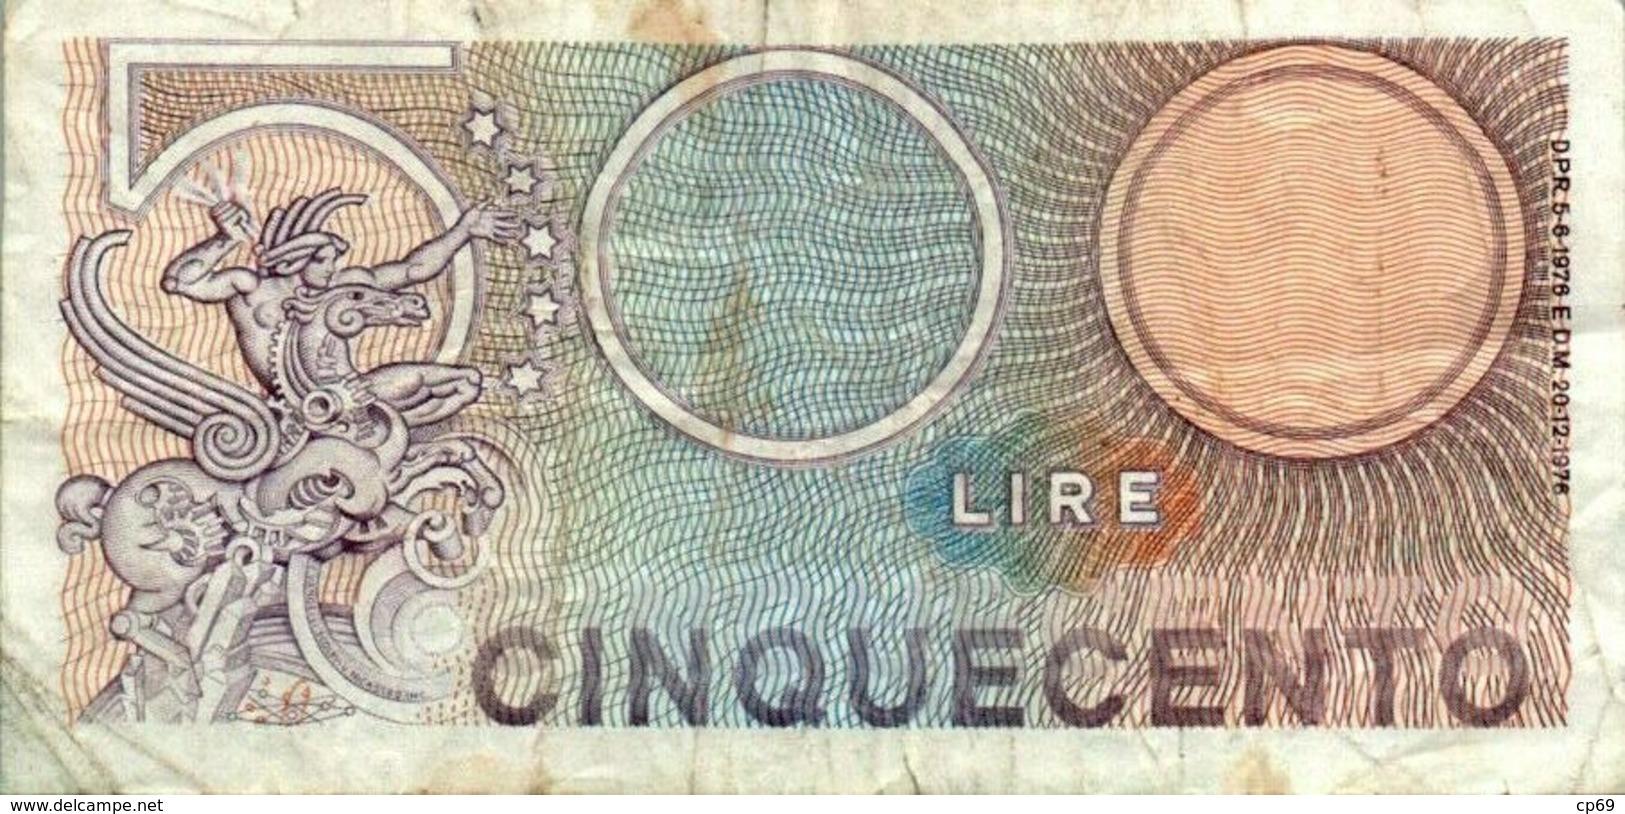 Billet De Banque Italien Italie 500 Lire Cinquecento T18 341903 20/12/1976 En B.Etat - 500 Lire